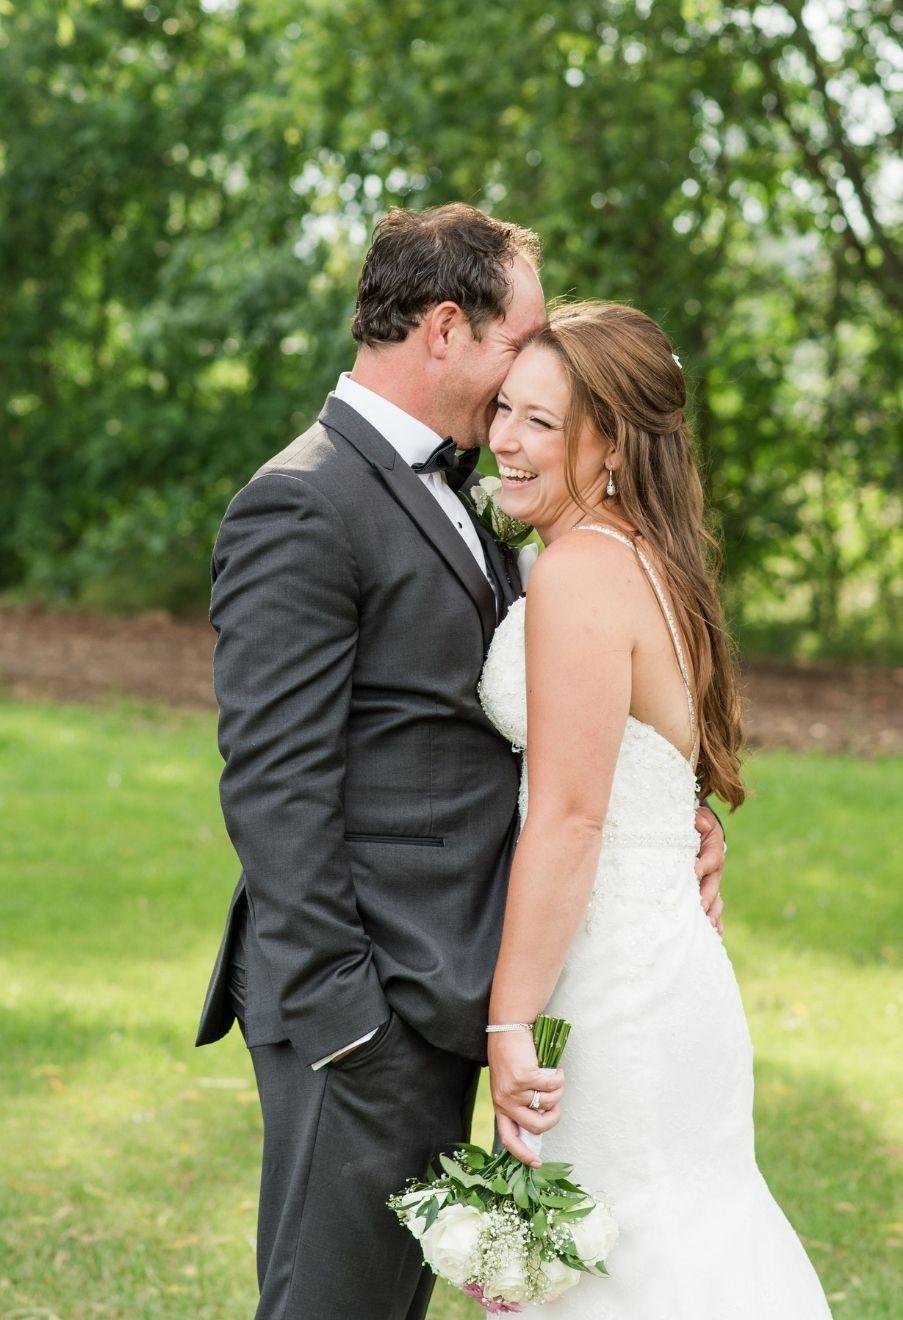 sweet bride and groom at wedding